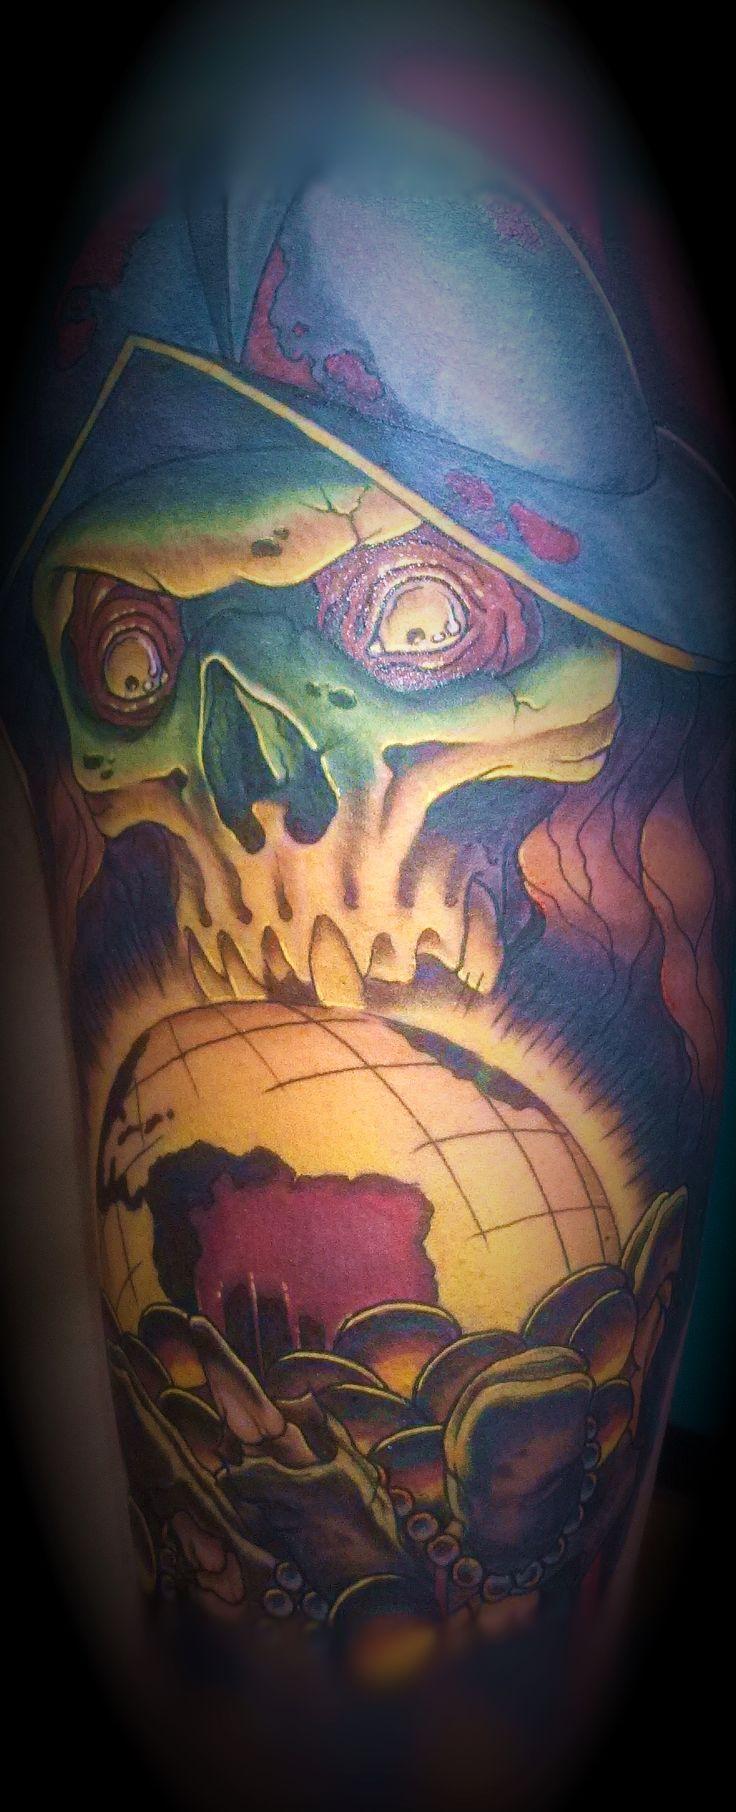 Done by tattoo artist Scott Mundy